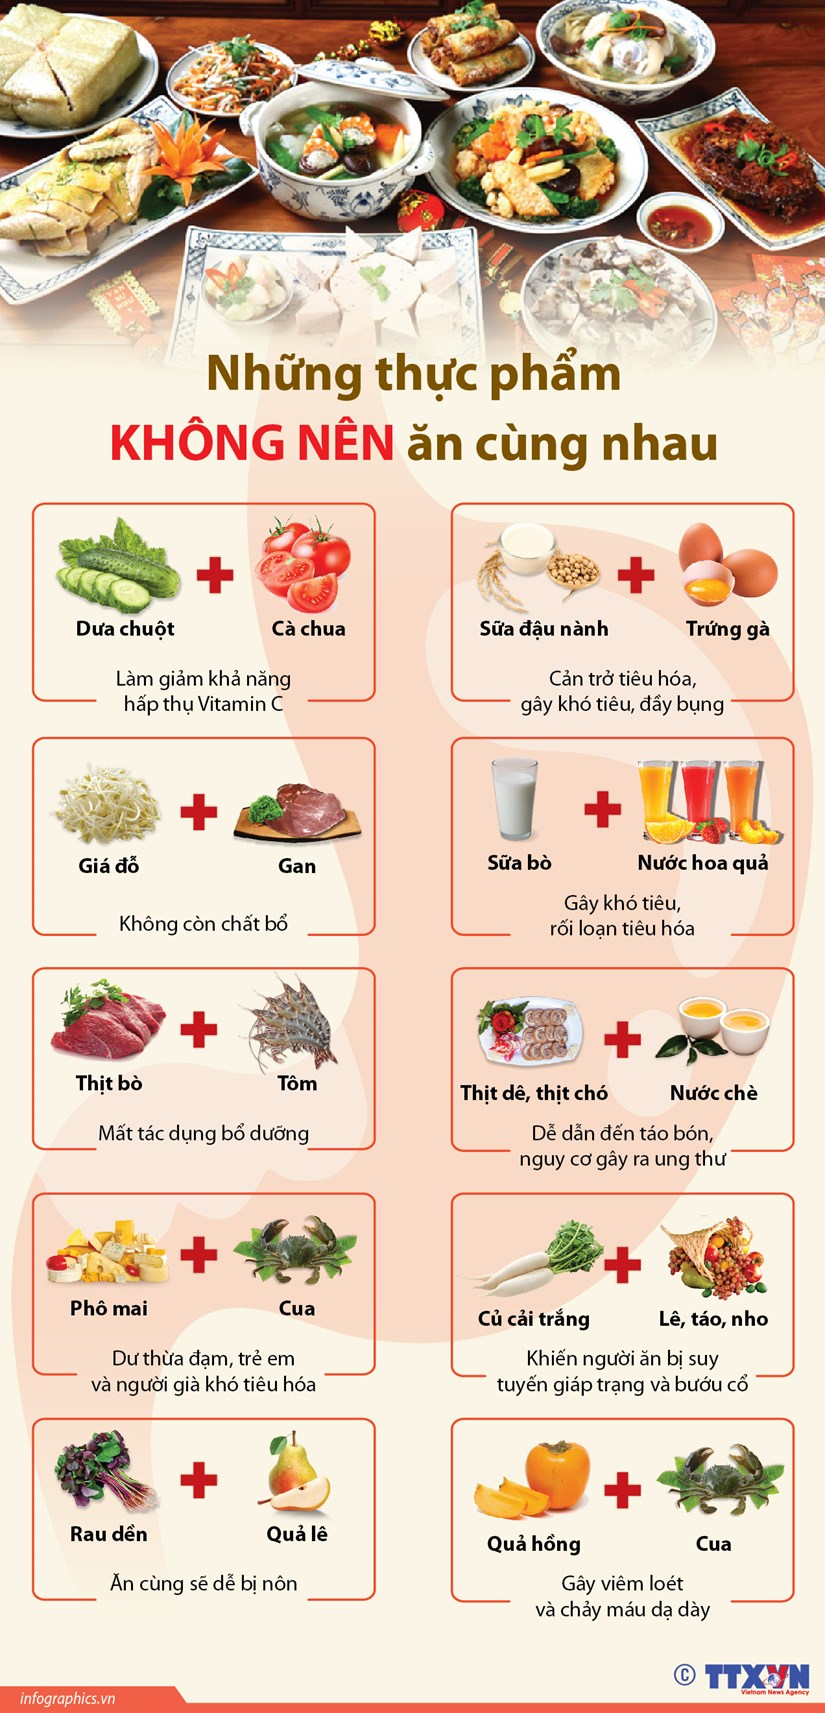 [Infographics] 10 cap thuc pham khong nen an cung nhau hinh anh 1